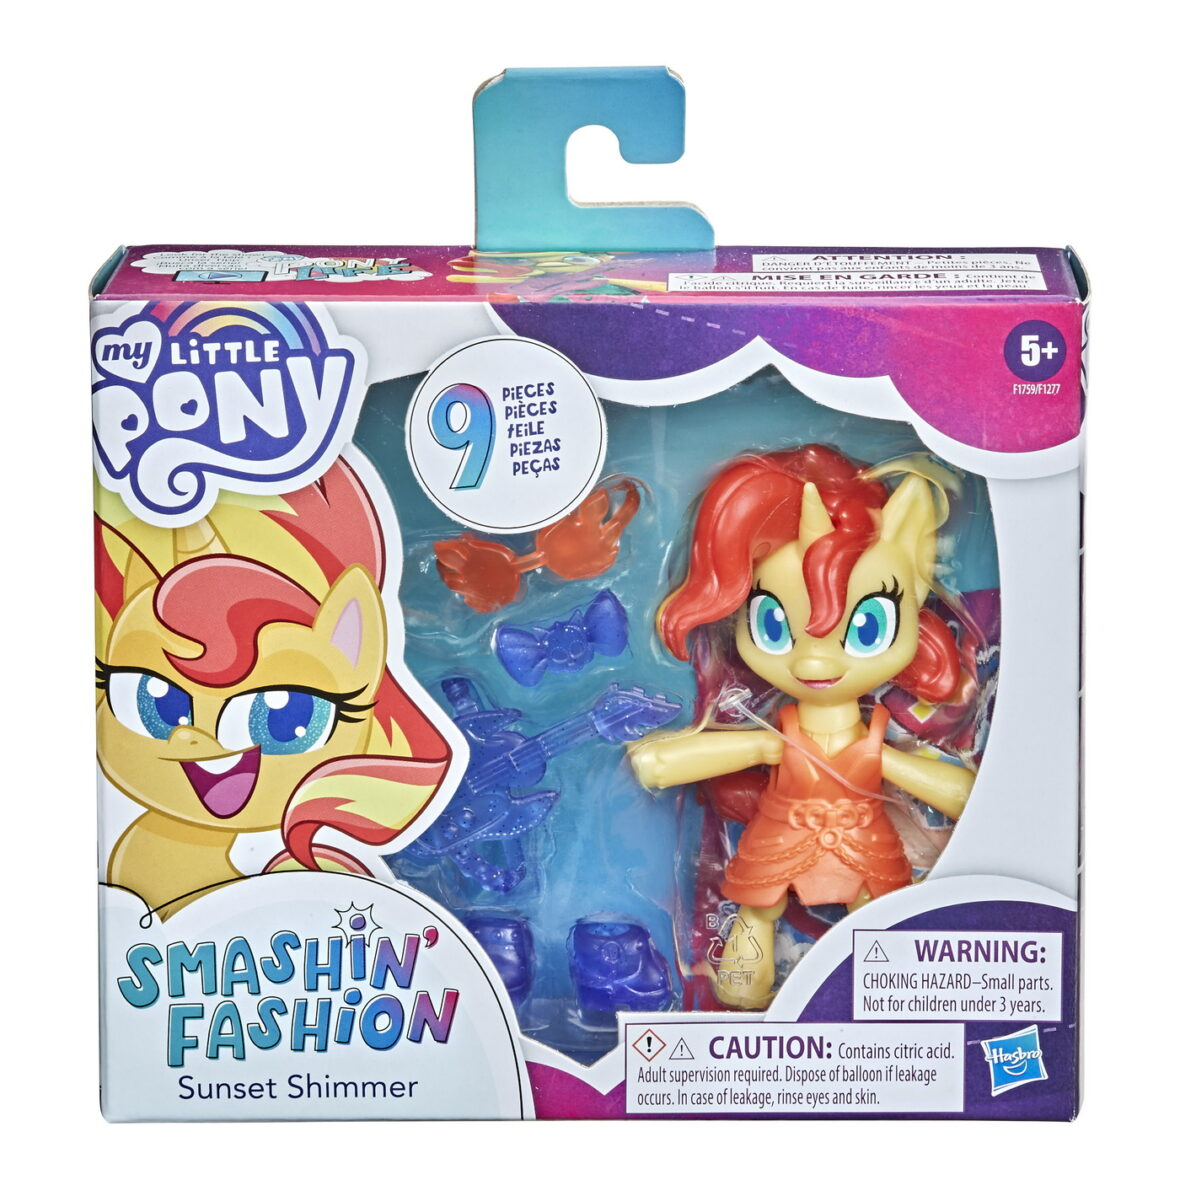 My Little Pony Smashin Fashion Sunset Shimmer